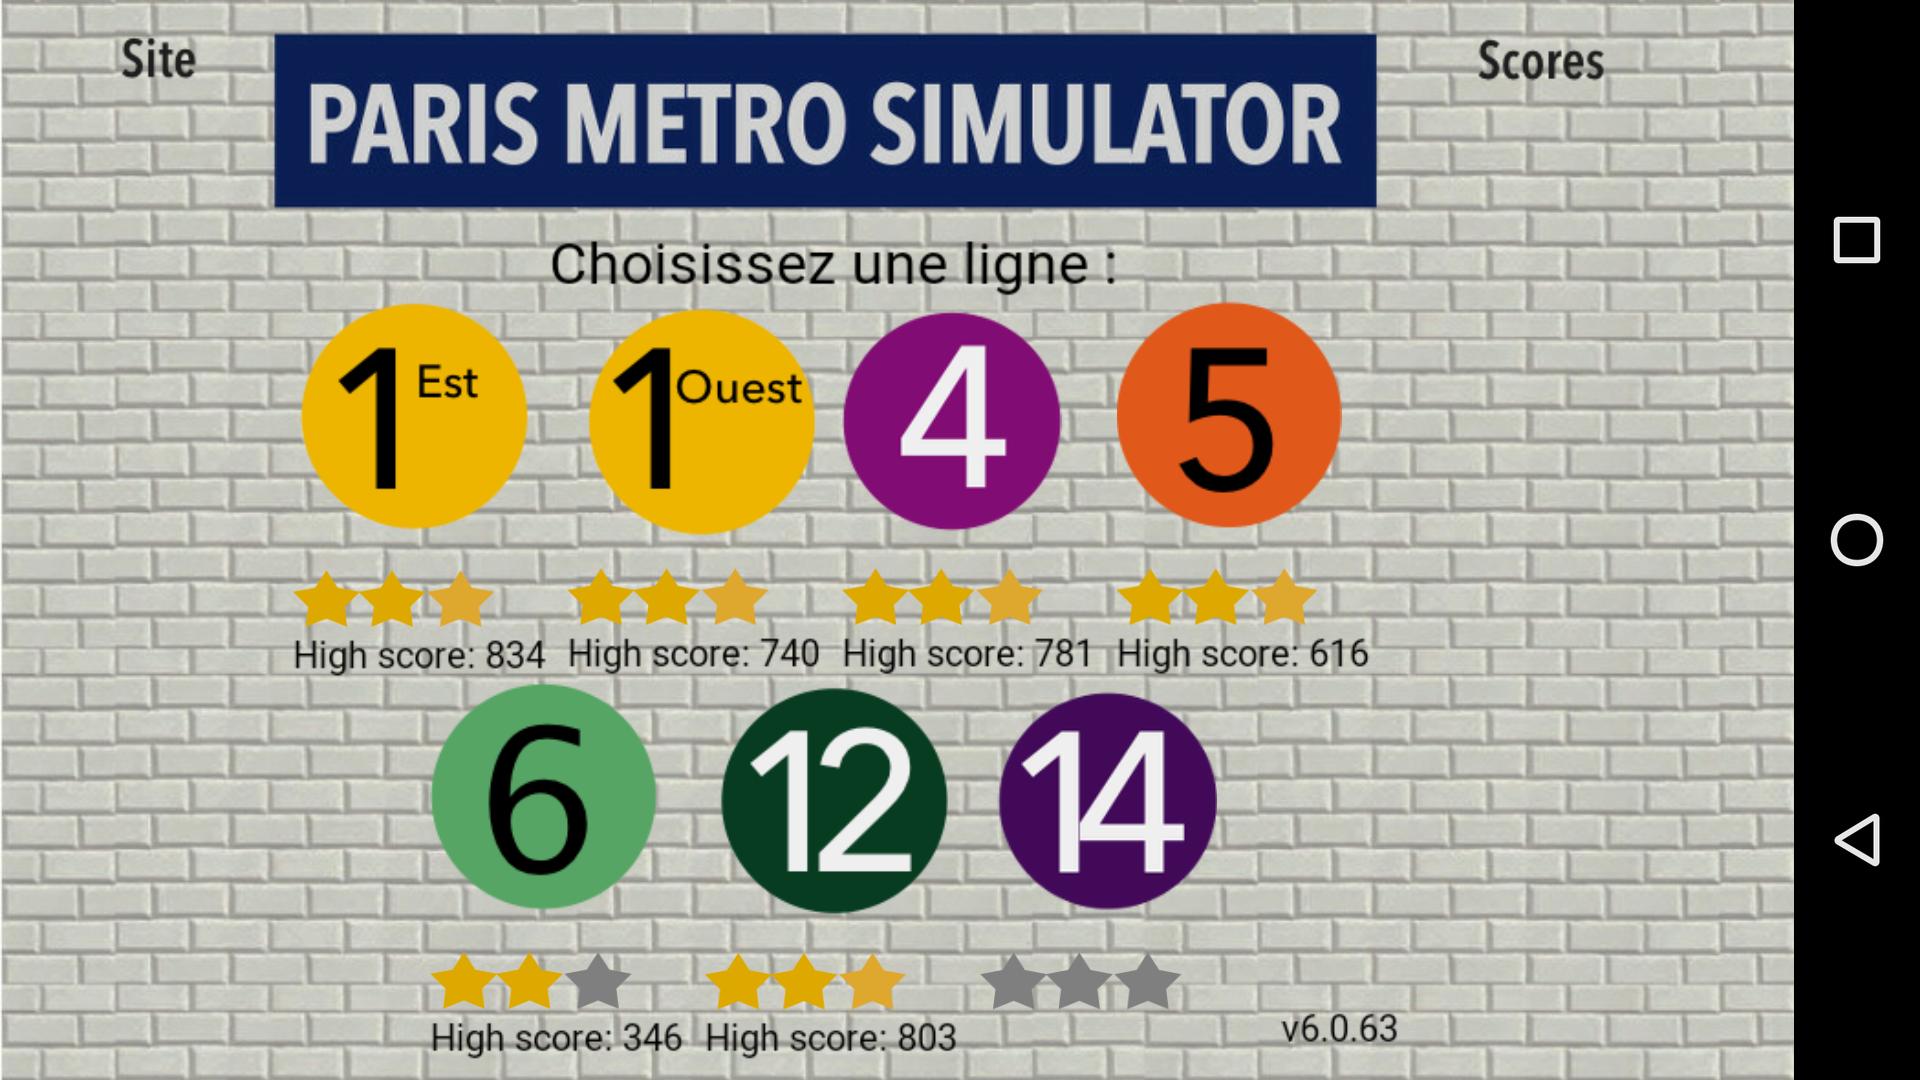 Mantalow: Paris Metro simulator [Line 5] (Android) 616 points on 2015-12-11 02:09:31